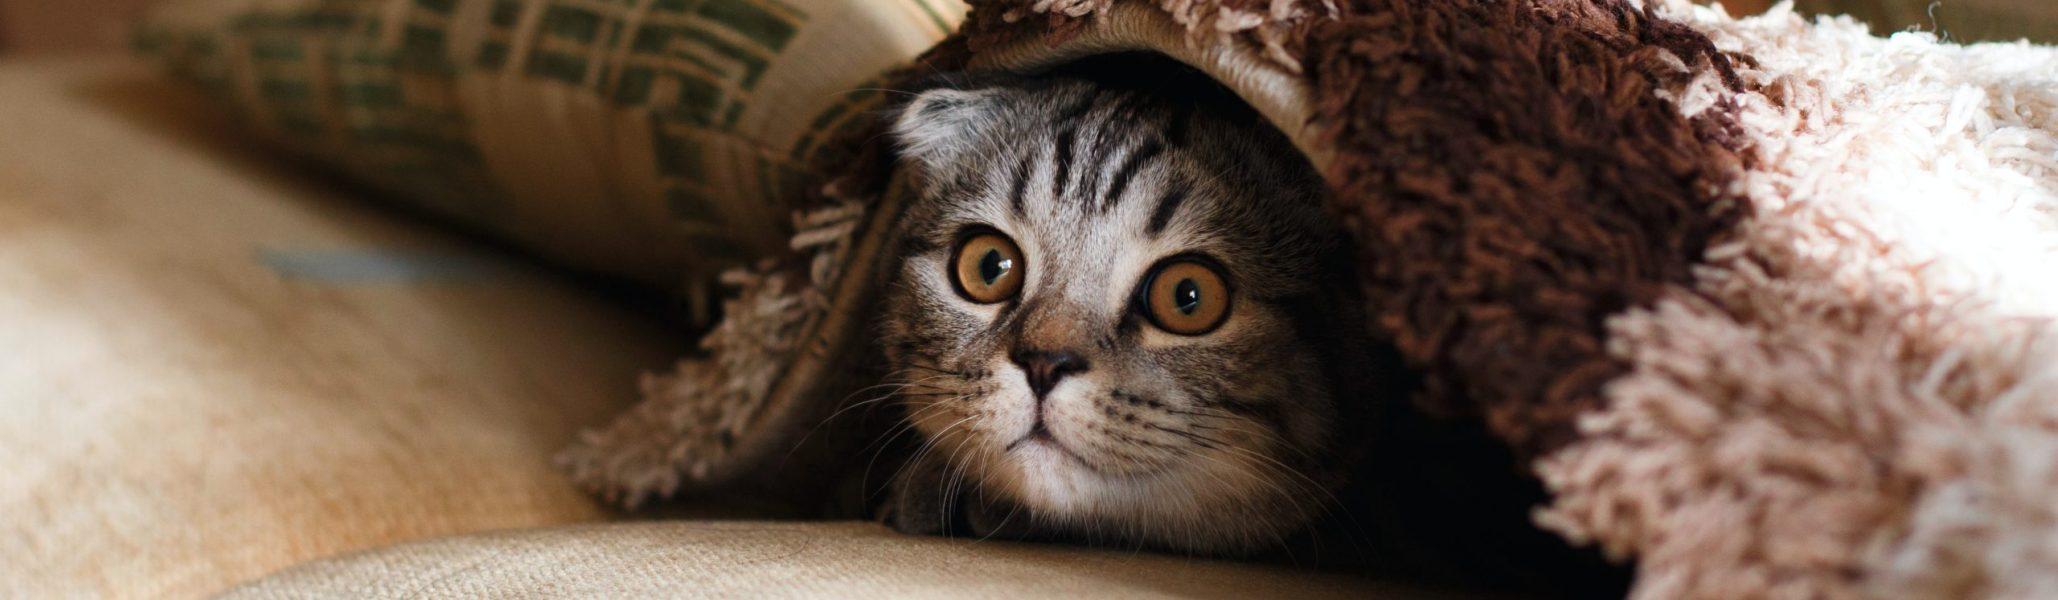 cat-unsplashed